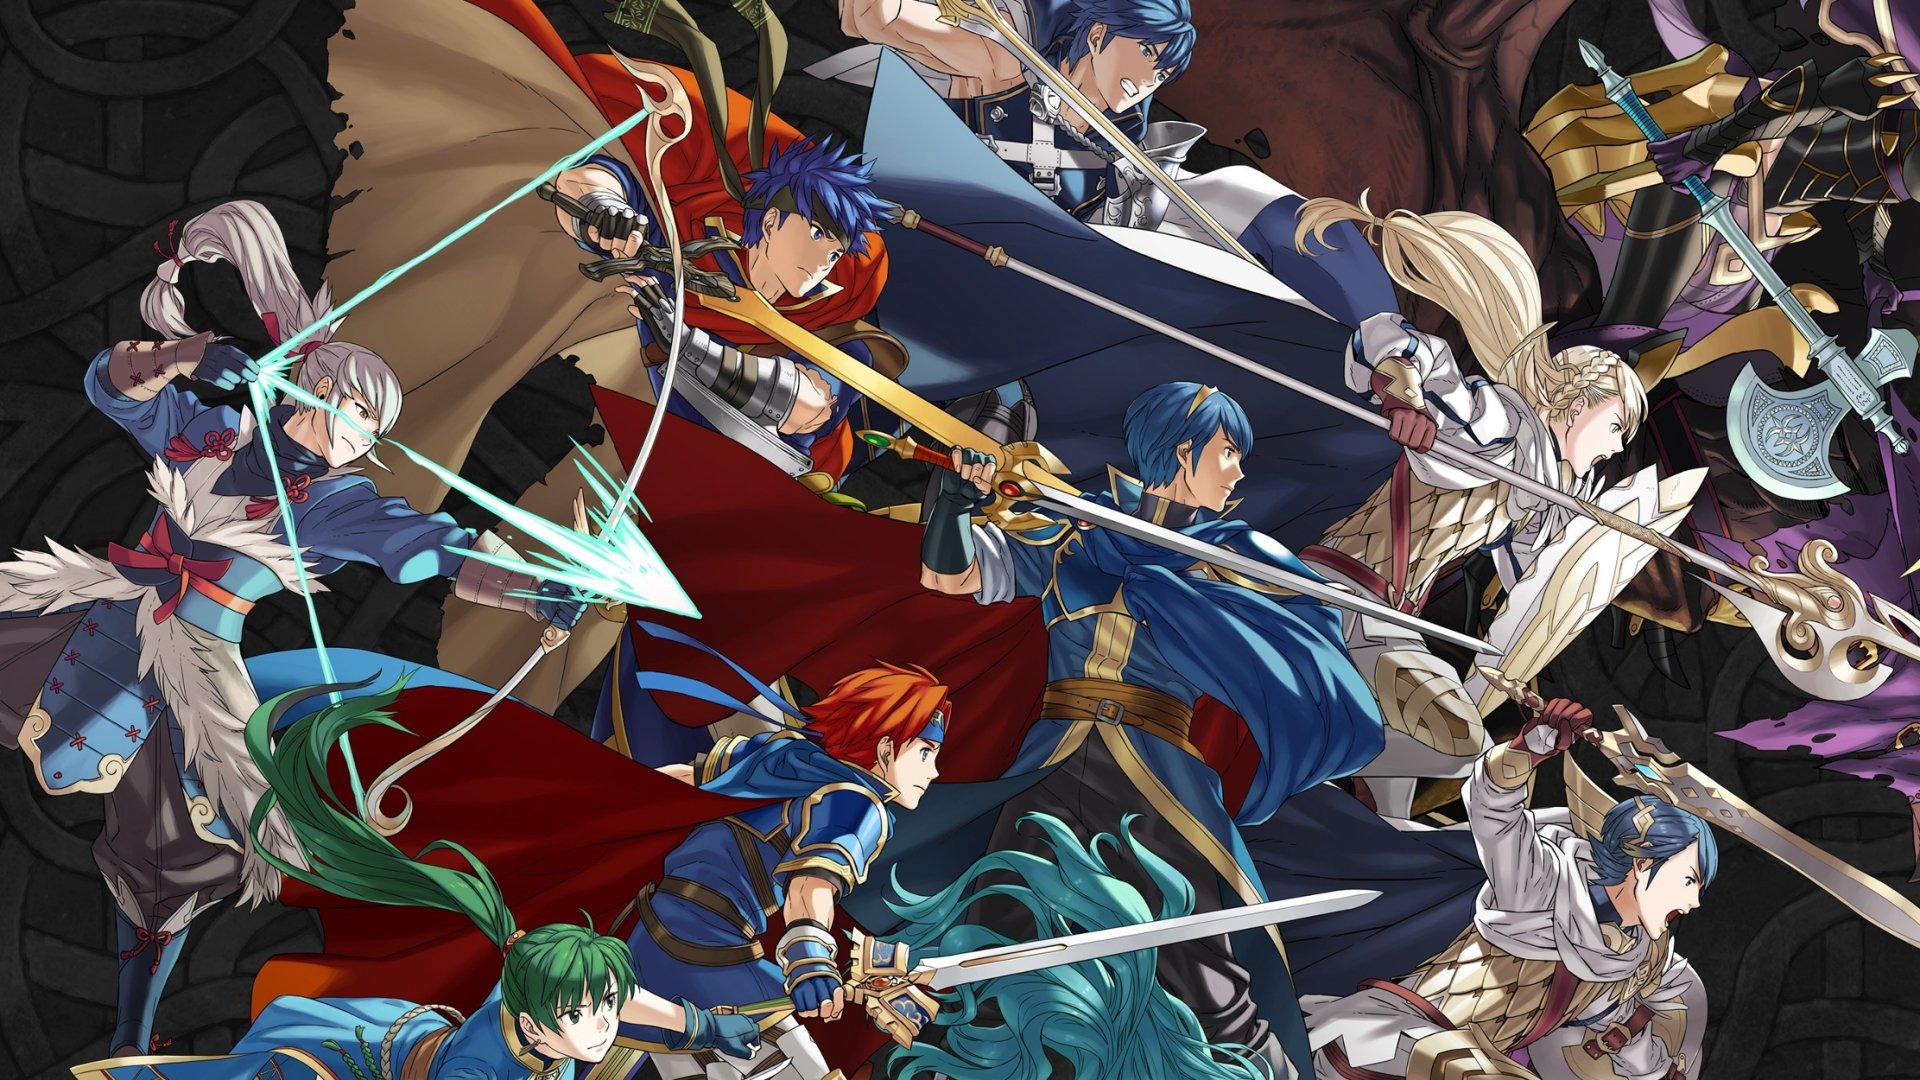 Fire Emblem Heroes artwork